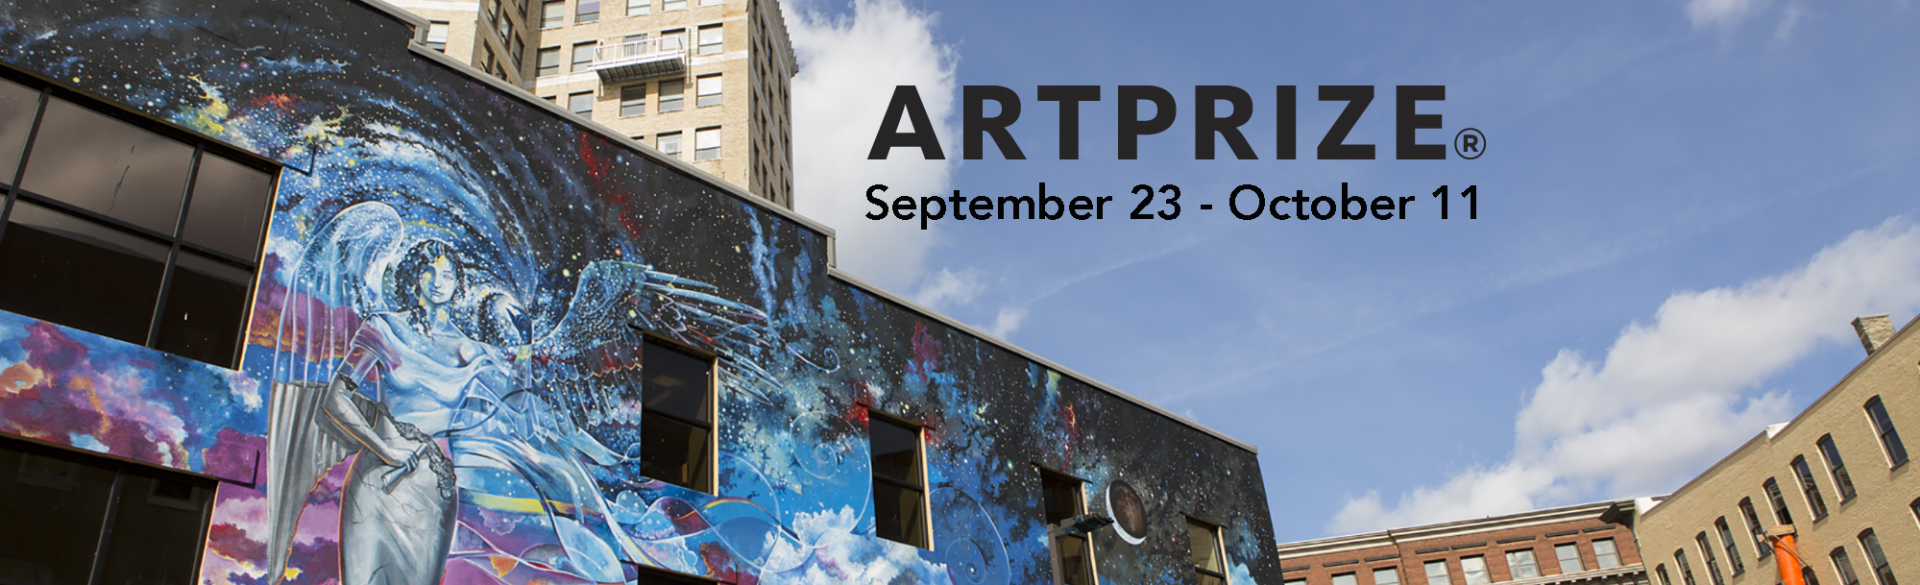 ArtPrize 2015